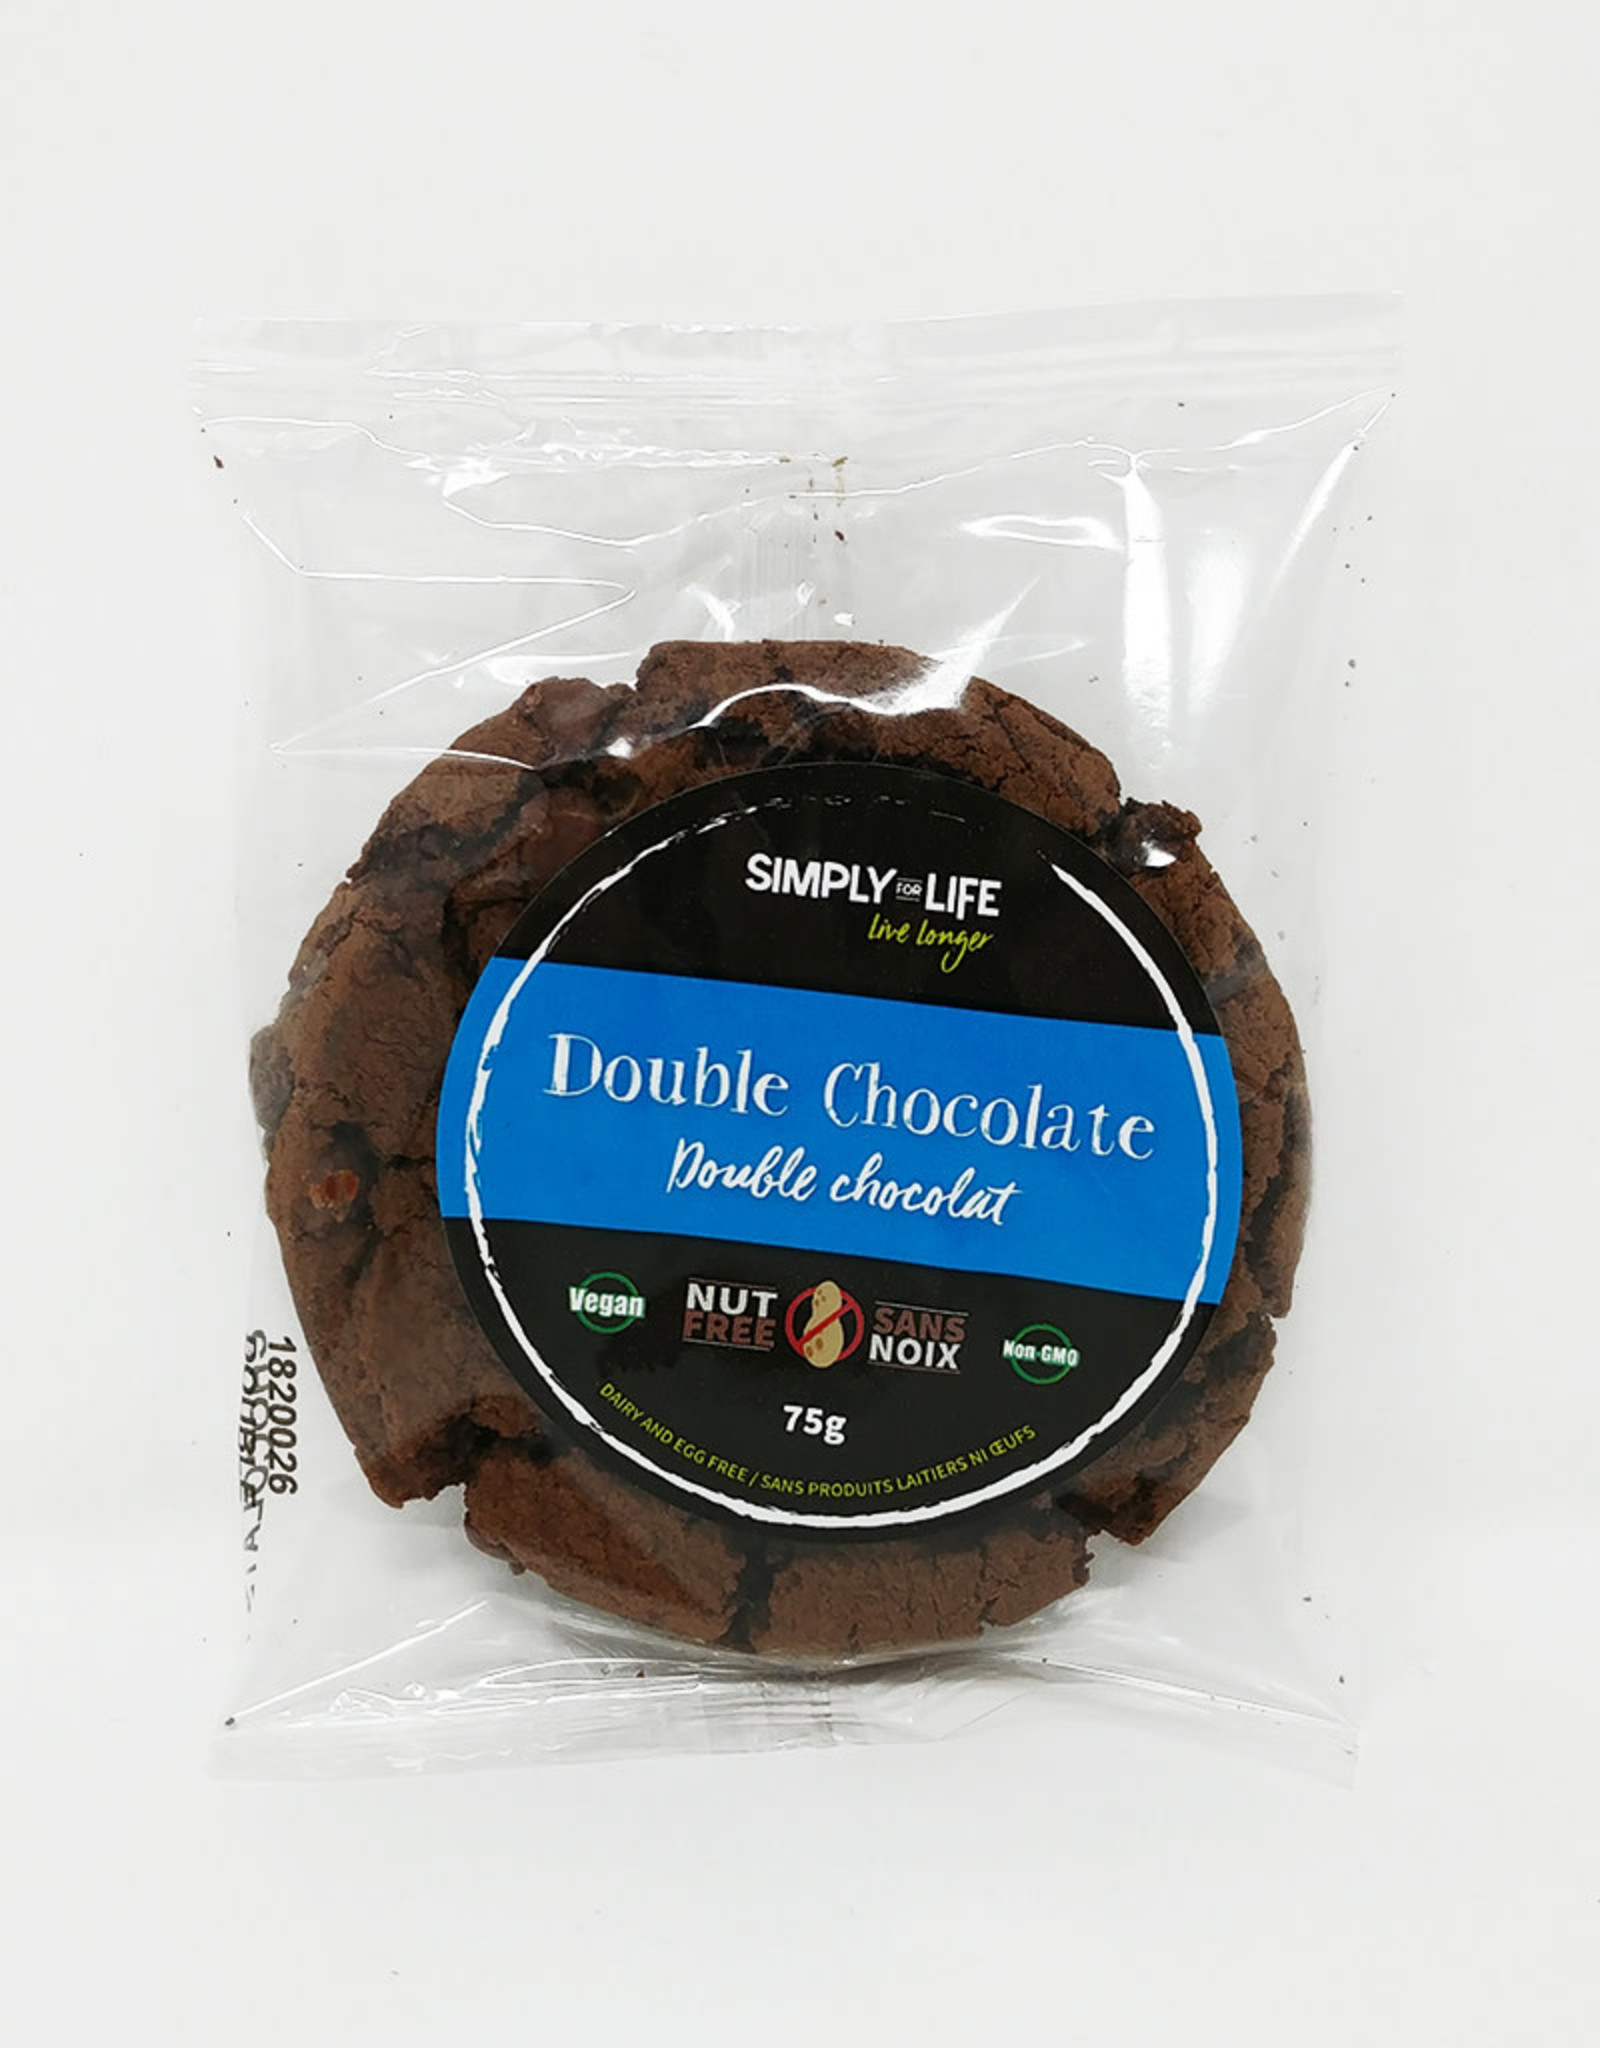 Sweets From The Earth Sweets From The Earth - SFL Cookies, Double Chocolate